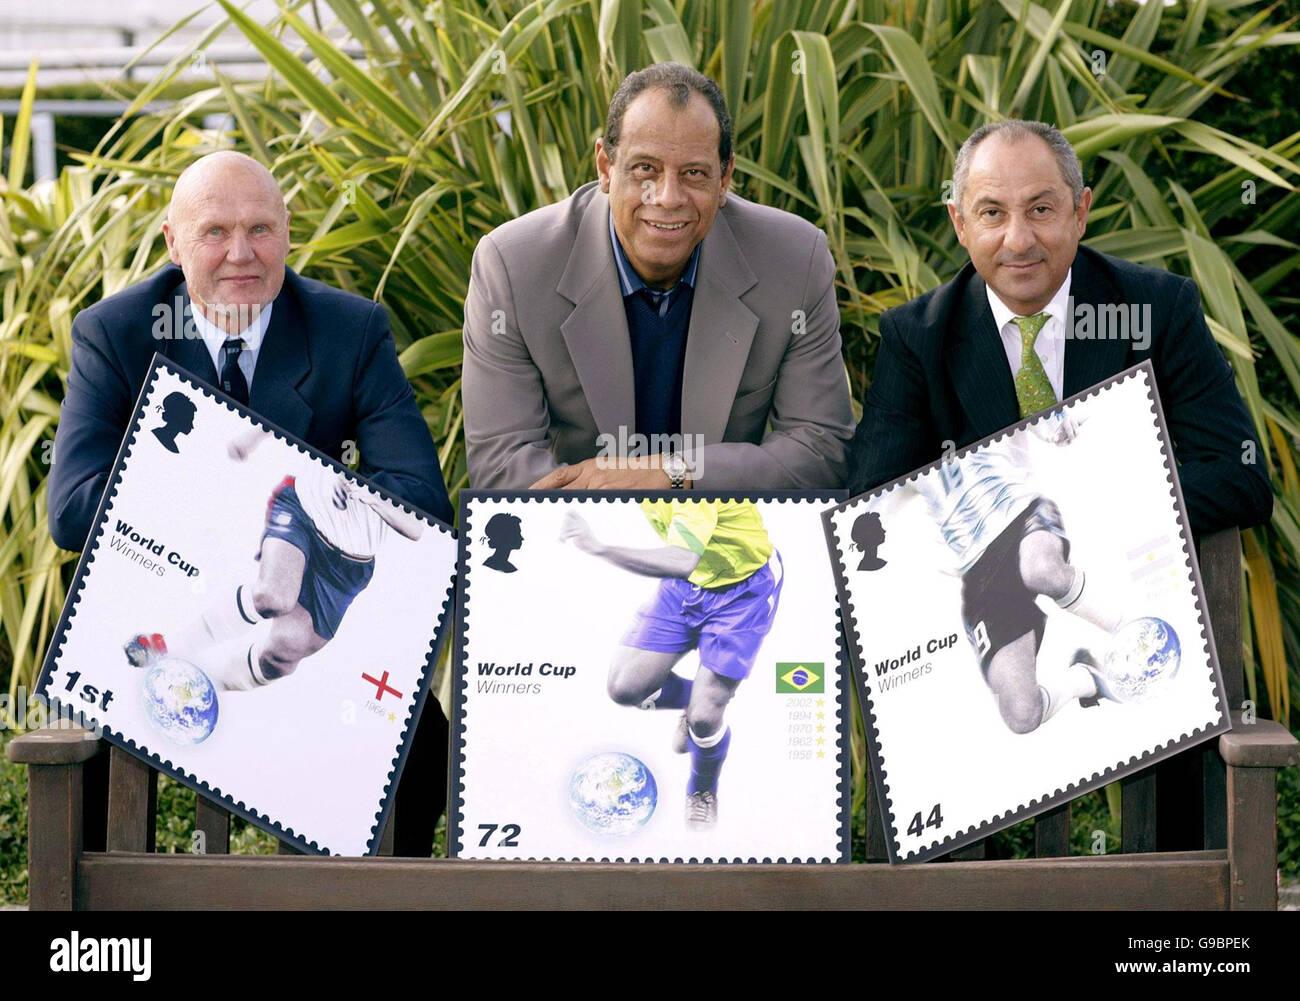 SHOWBIZ Stamps - Stock Image